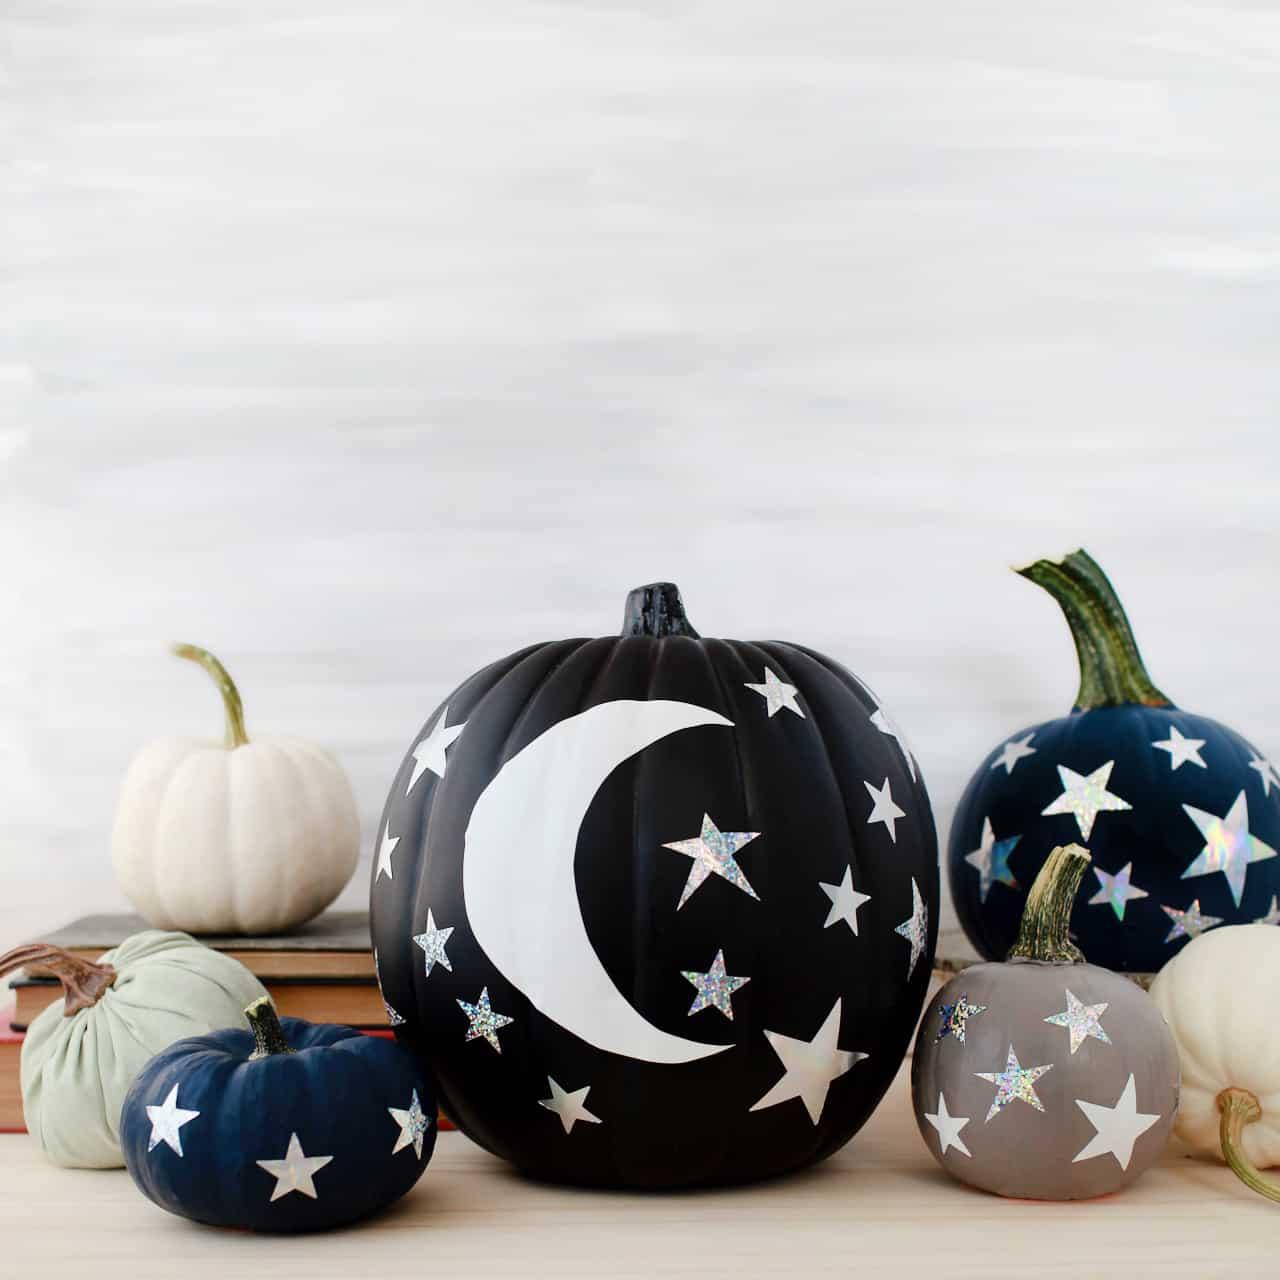 diy-moon-and-stars-pumpkin